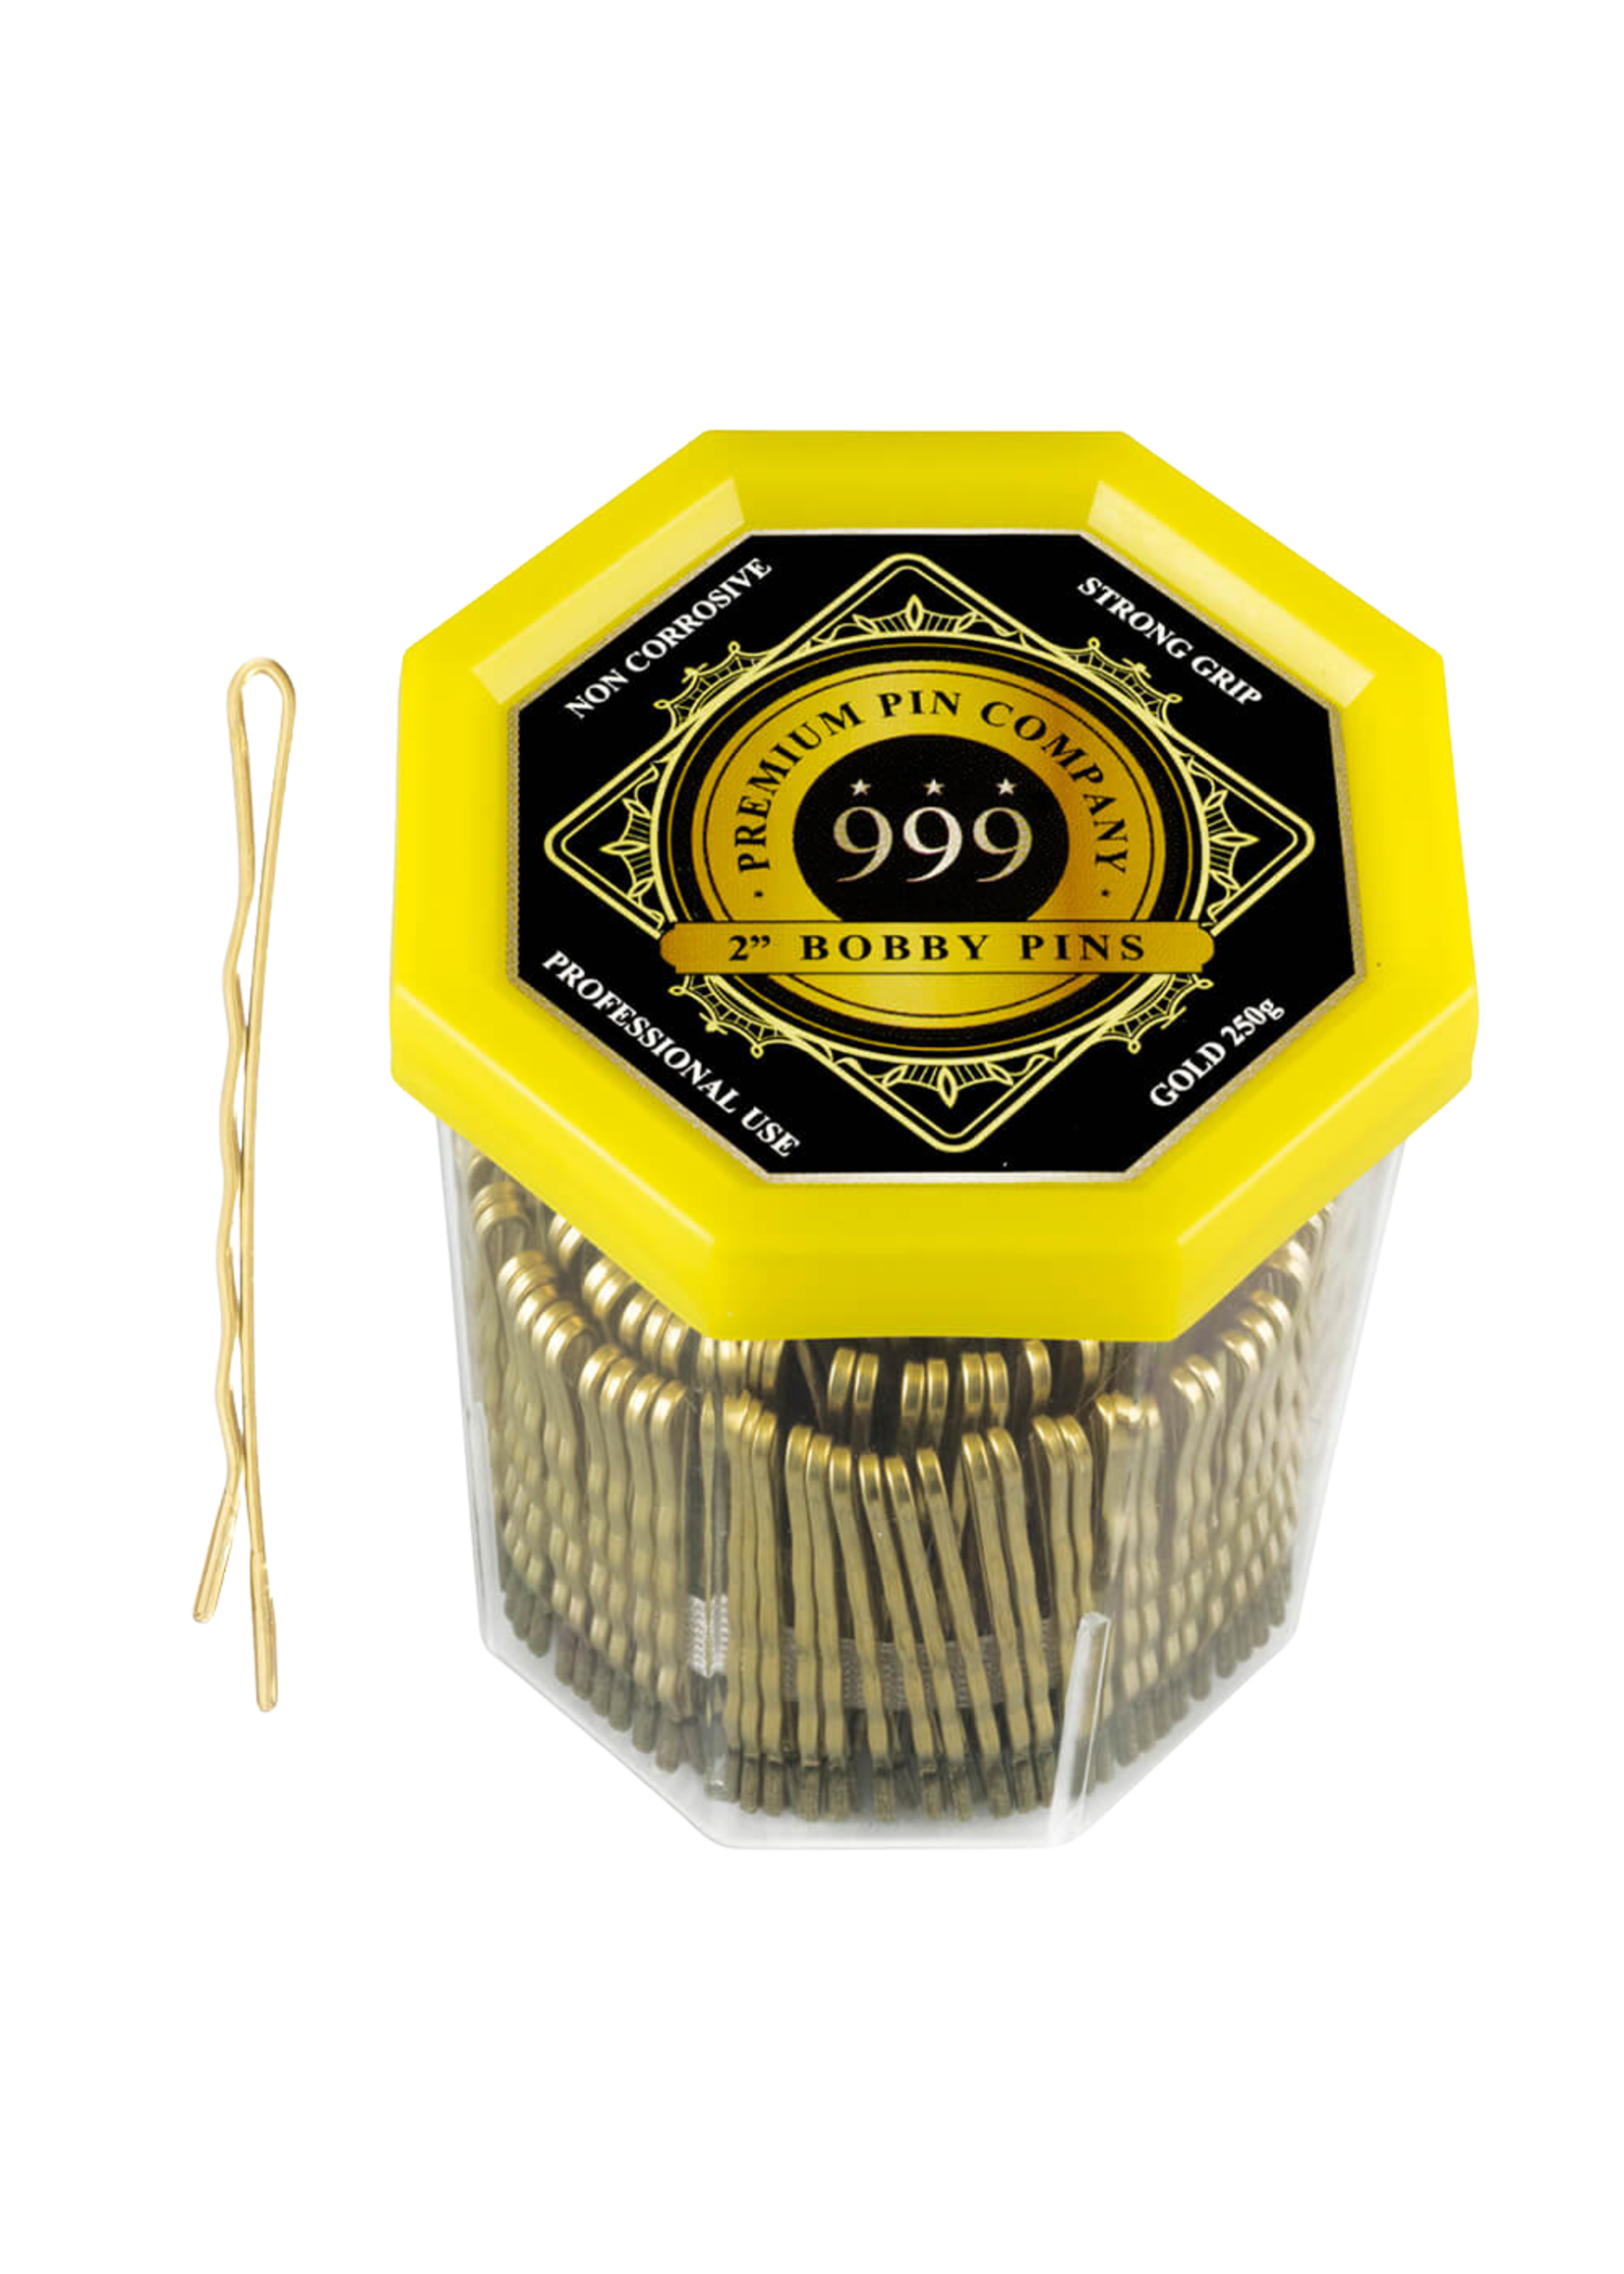 "999 Premium Pin Company 999 Bobby Pins 2"" Gold Tub 250g"